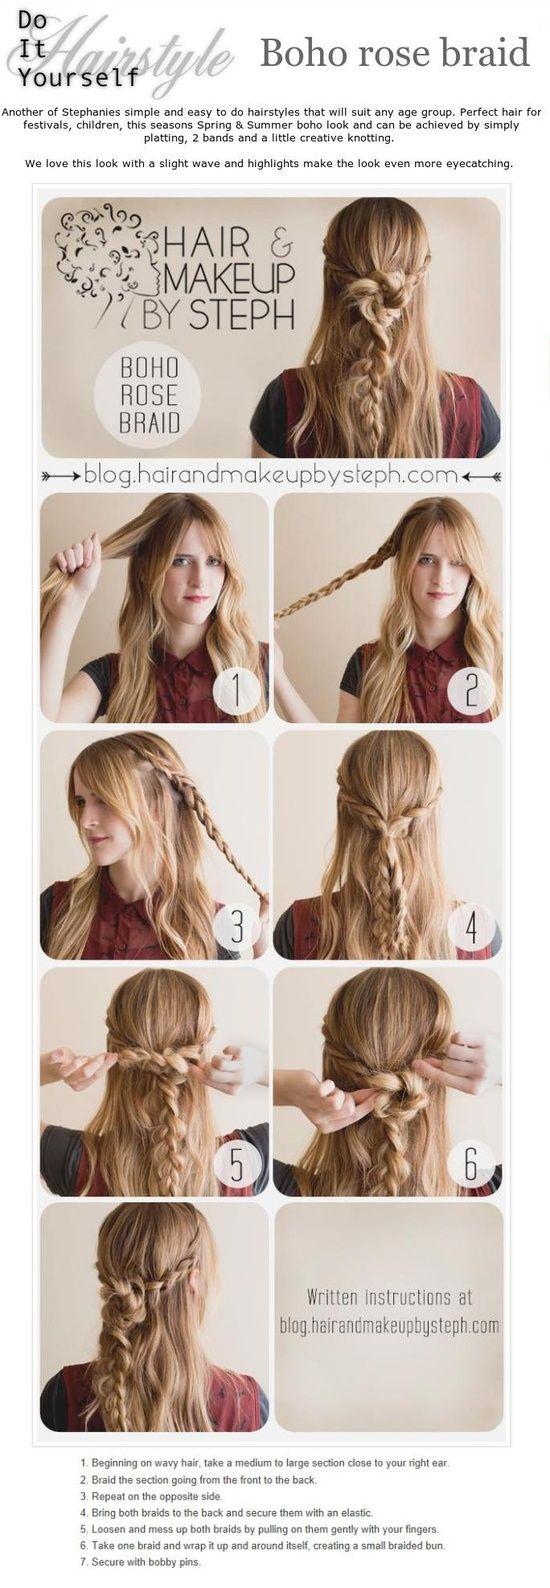 Boho rose braid via blog.hairandmakeupbysteph (With images) | Hair lengths, Hair styles, Braided ...